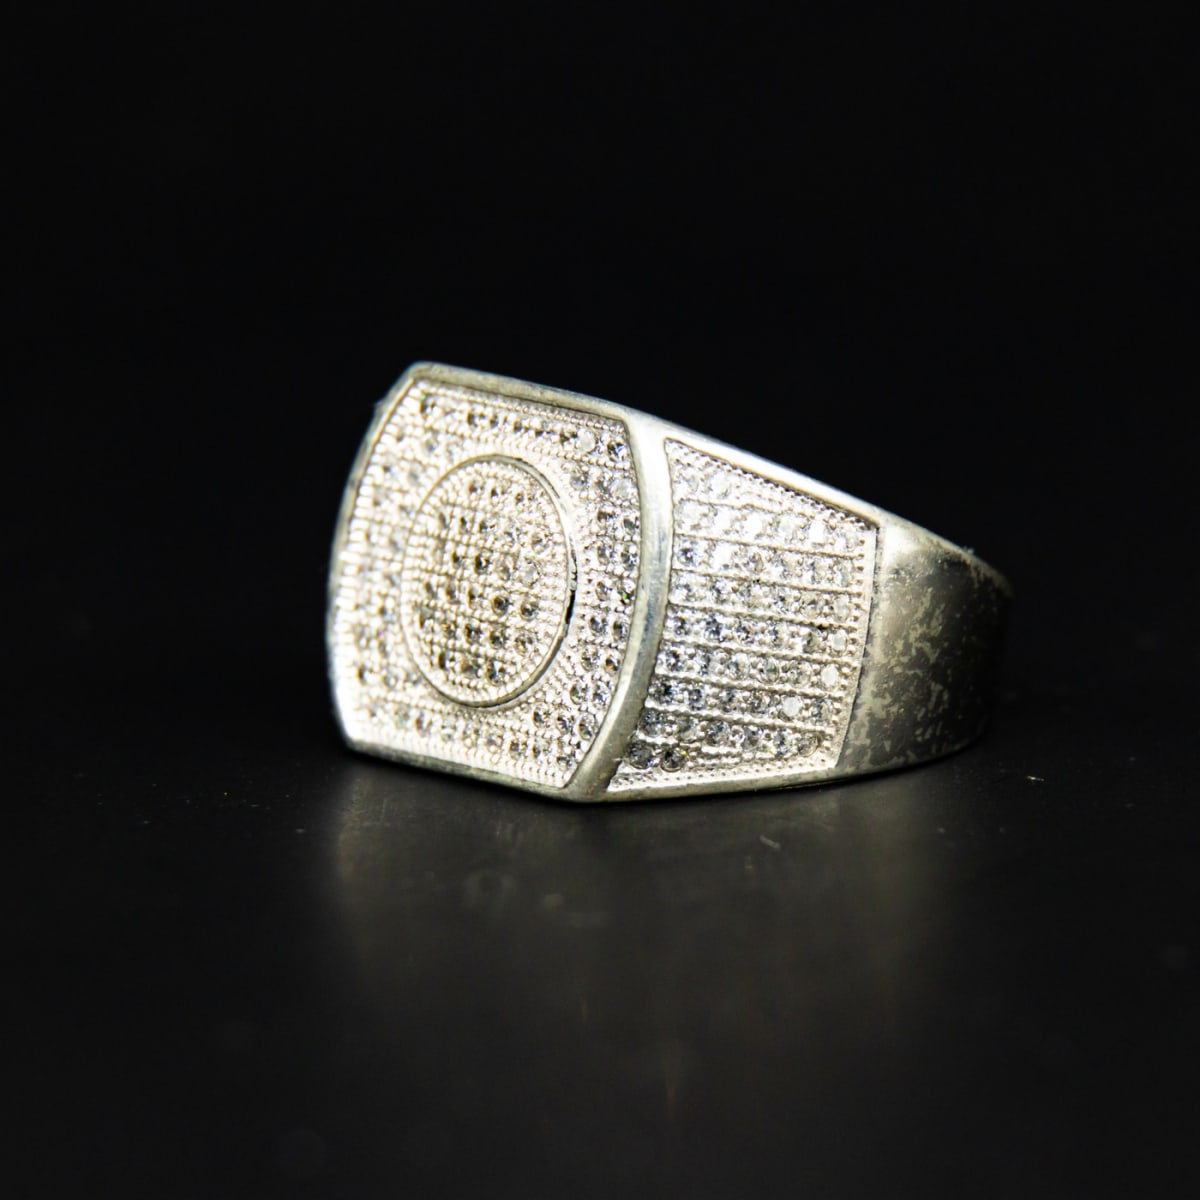 925 Silver Zircon Centerpiece Ring